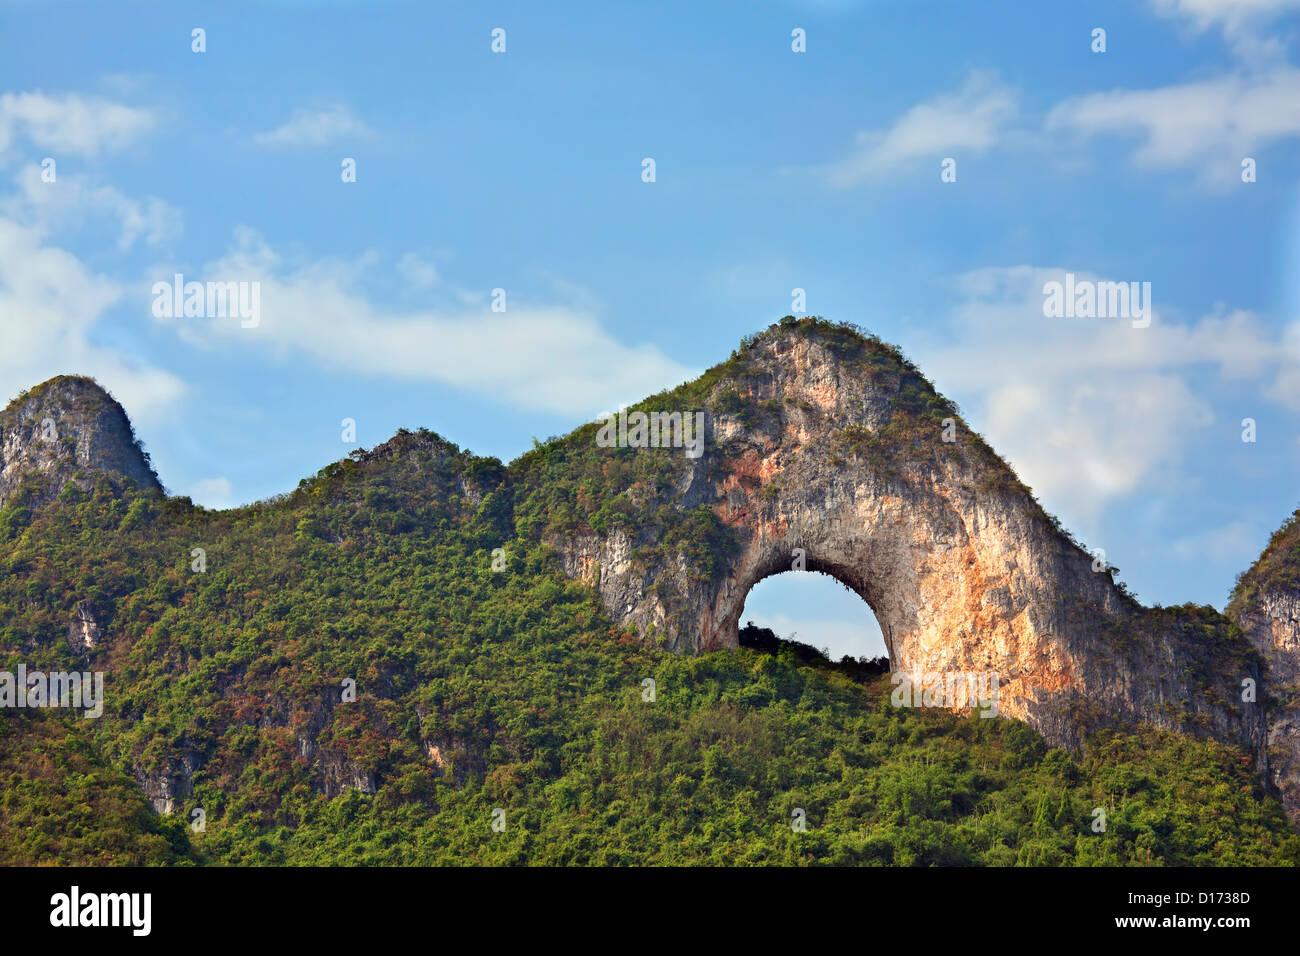 Moon Hill außerhalb von Yangshuo, Guangxi autonome Region, China Stockbild